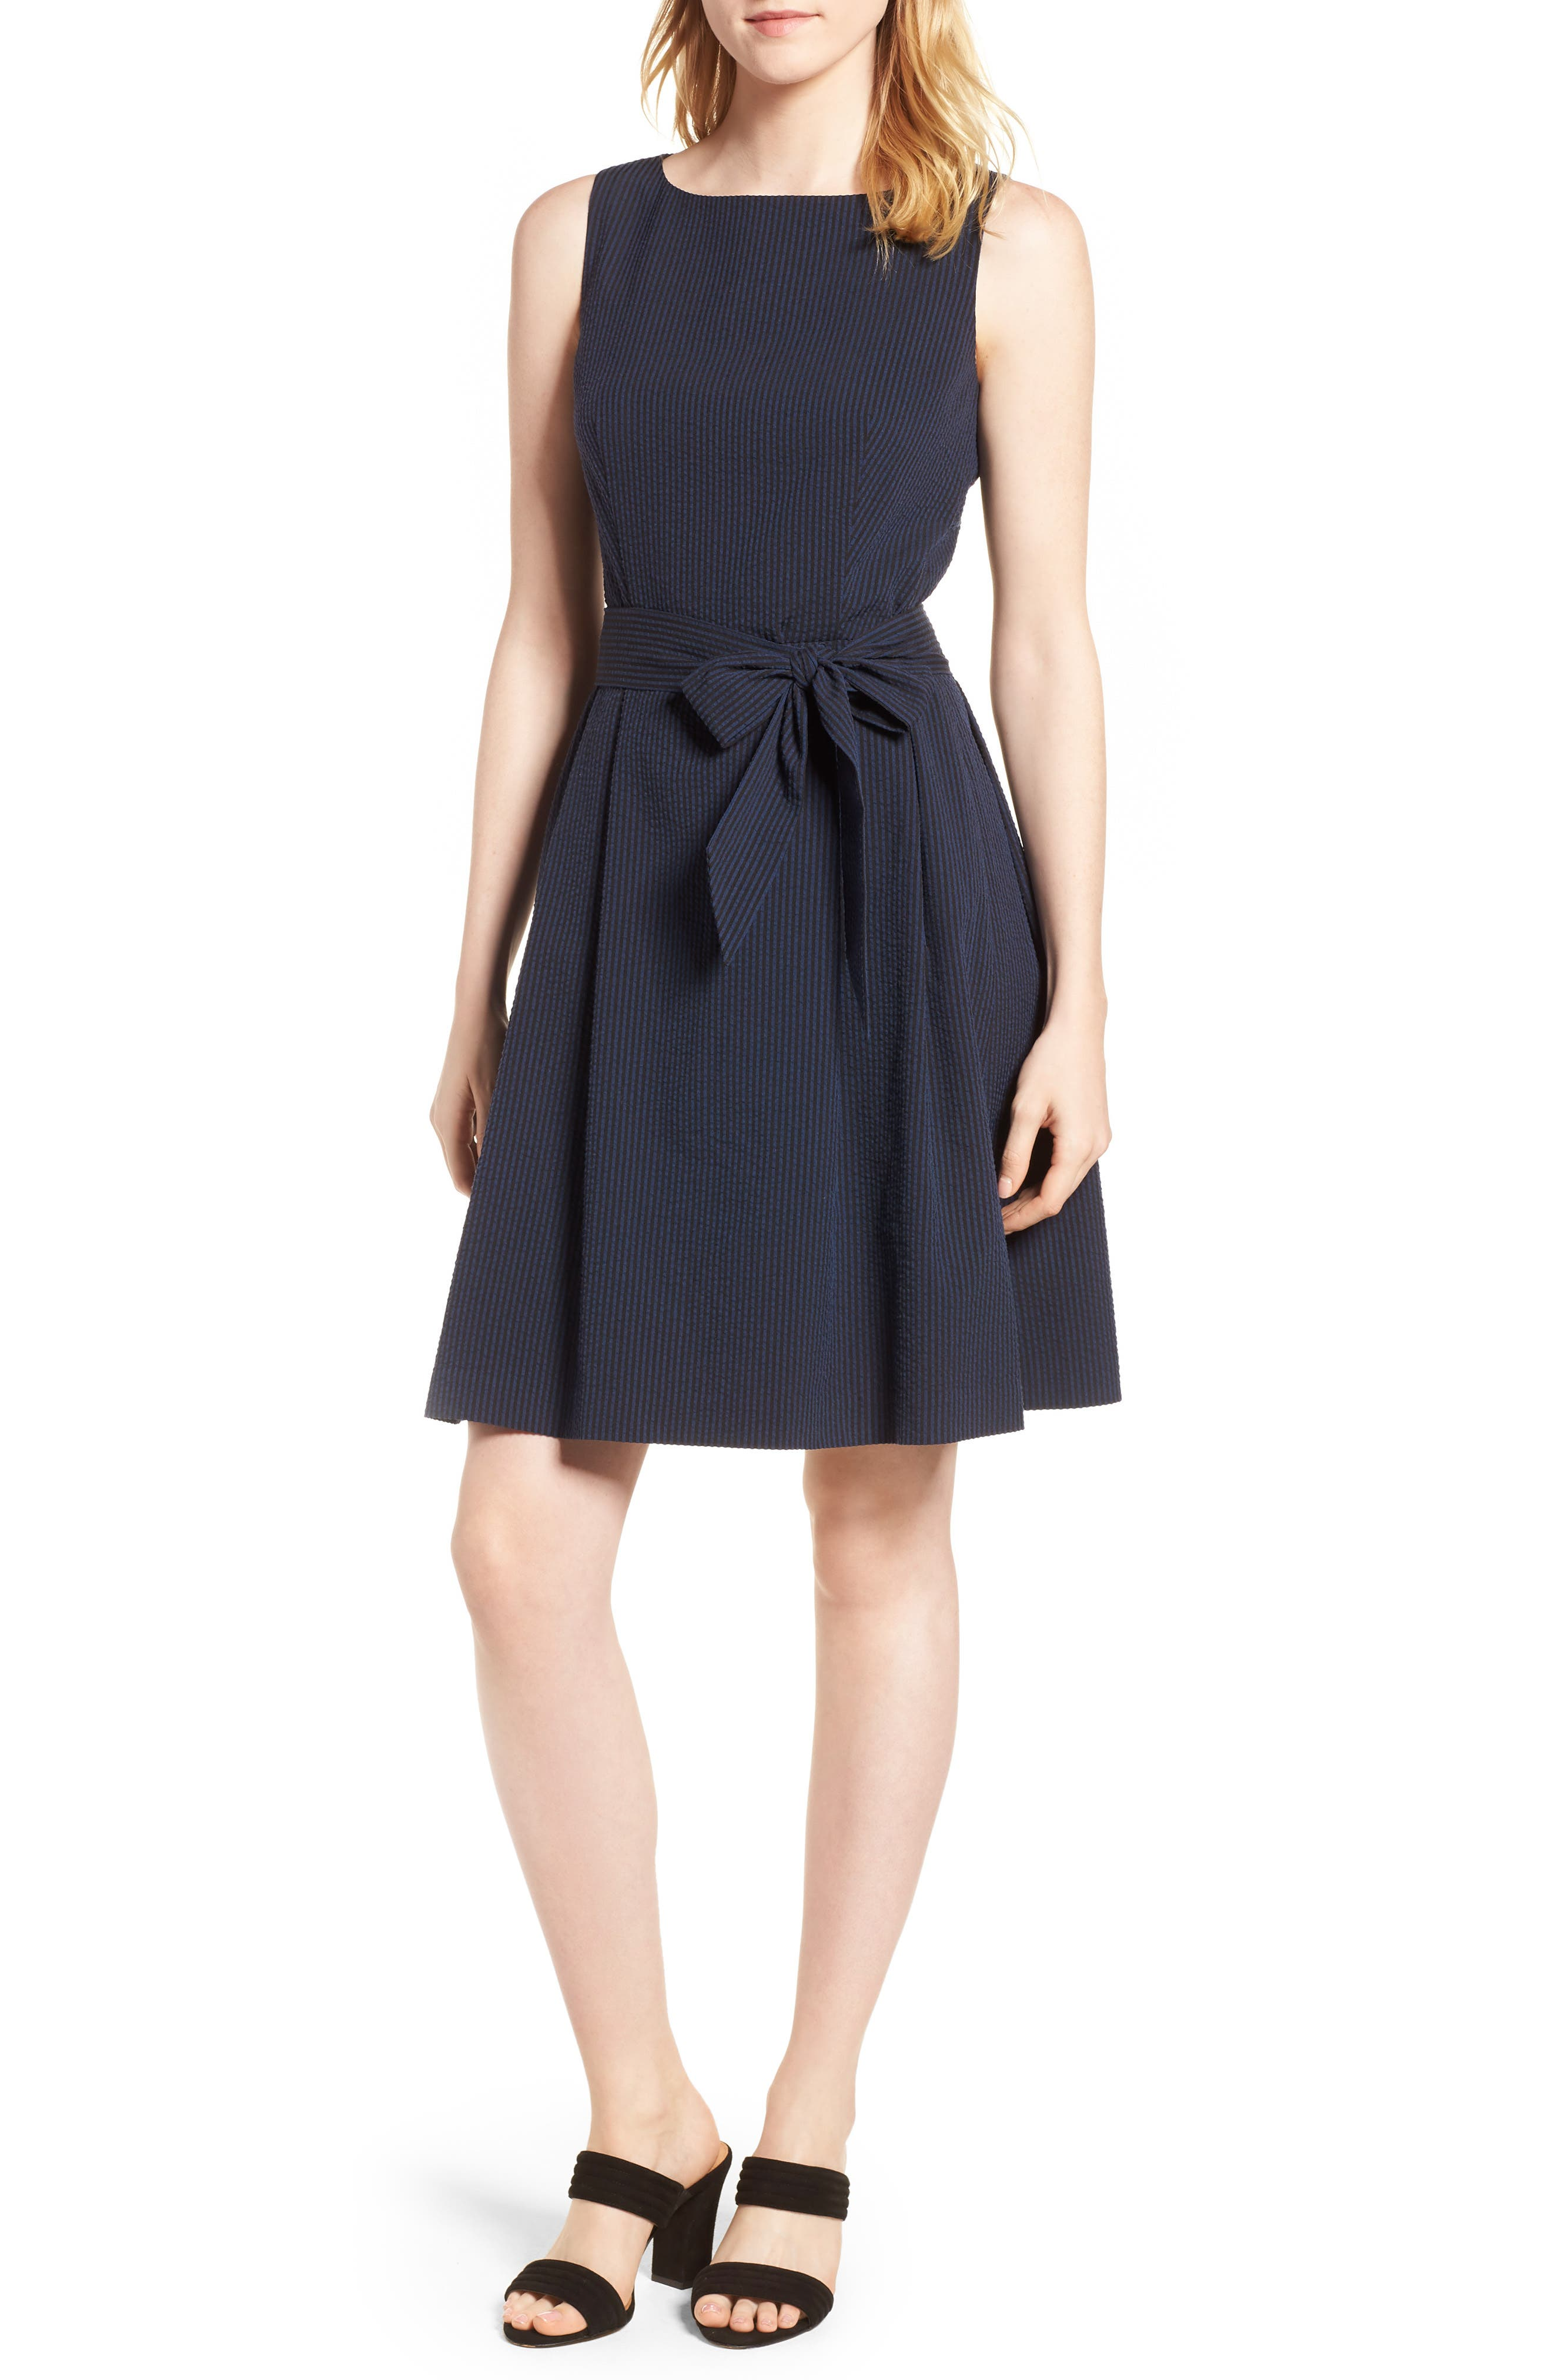 Alternate Image 1 Selected - Anne Klein Seersucker Fit & Flare Dress